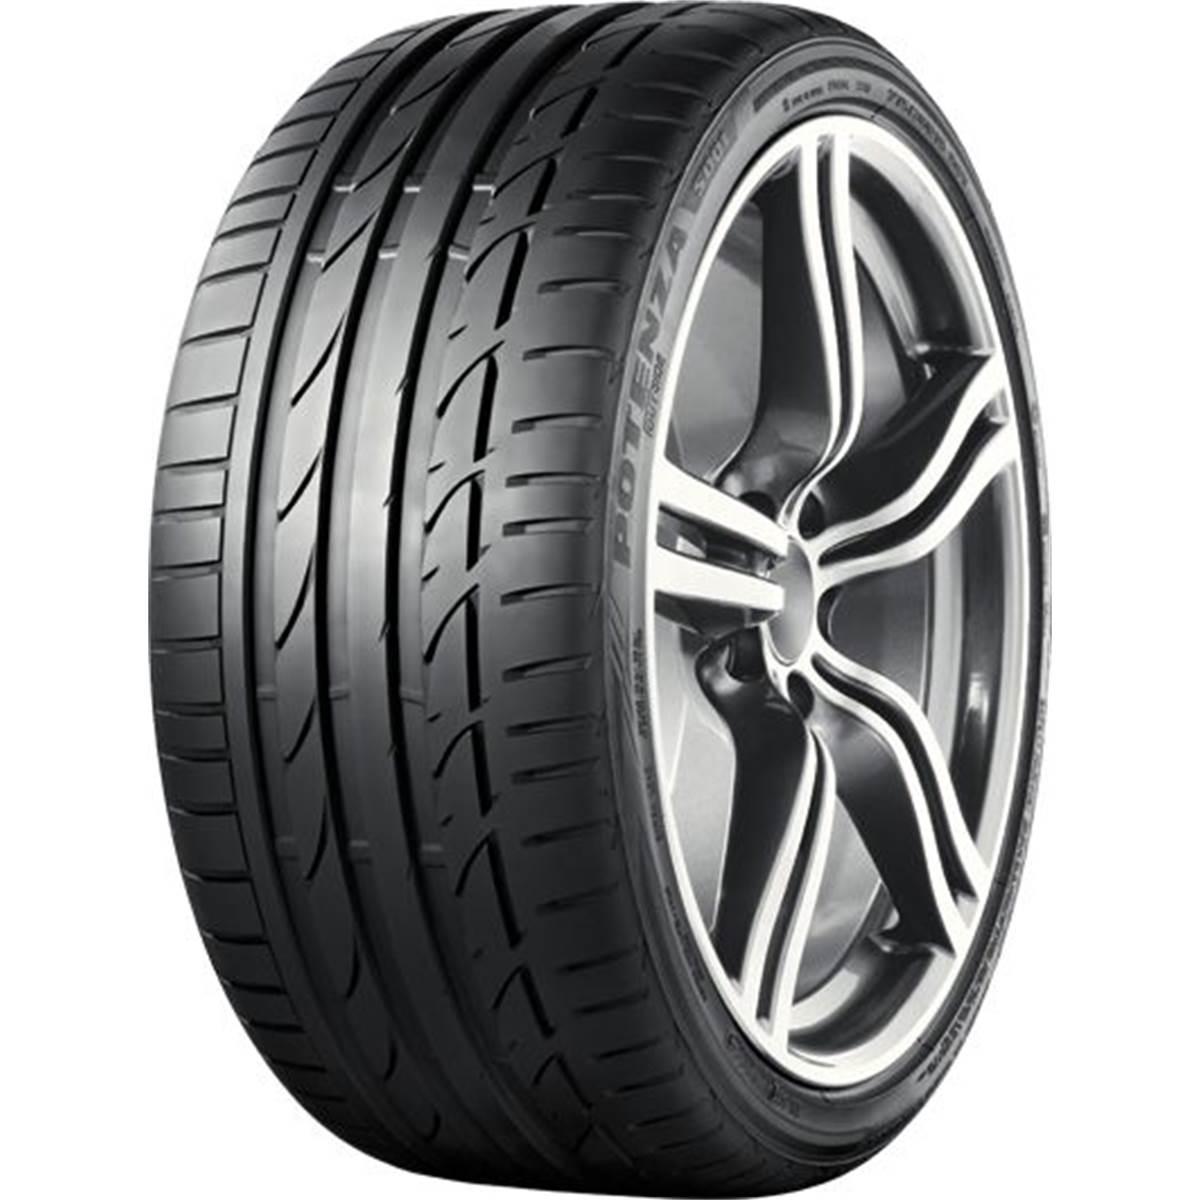 Pneu Bridgestone 245/50R18 100W Potenza S001